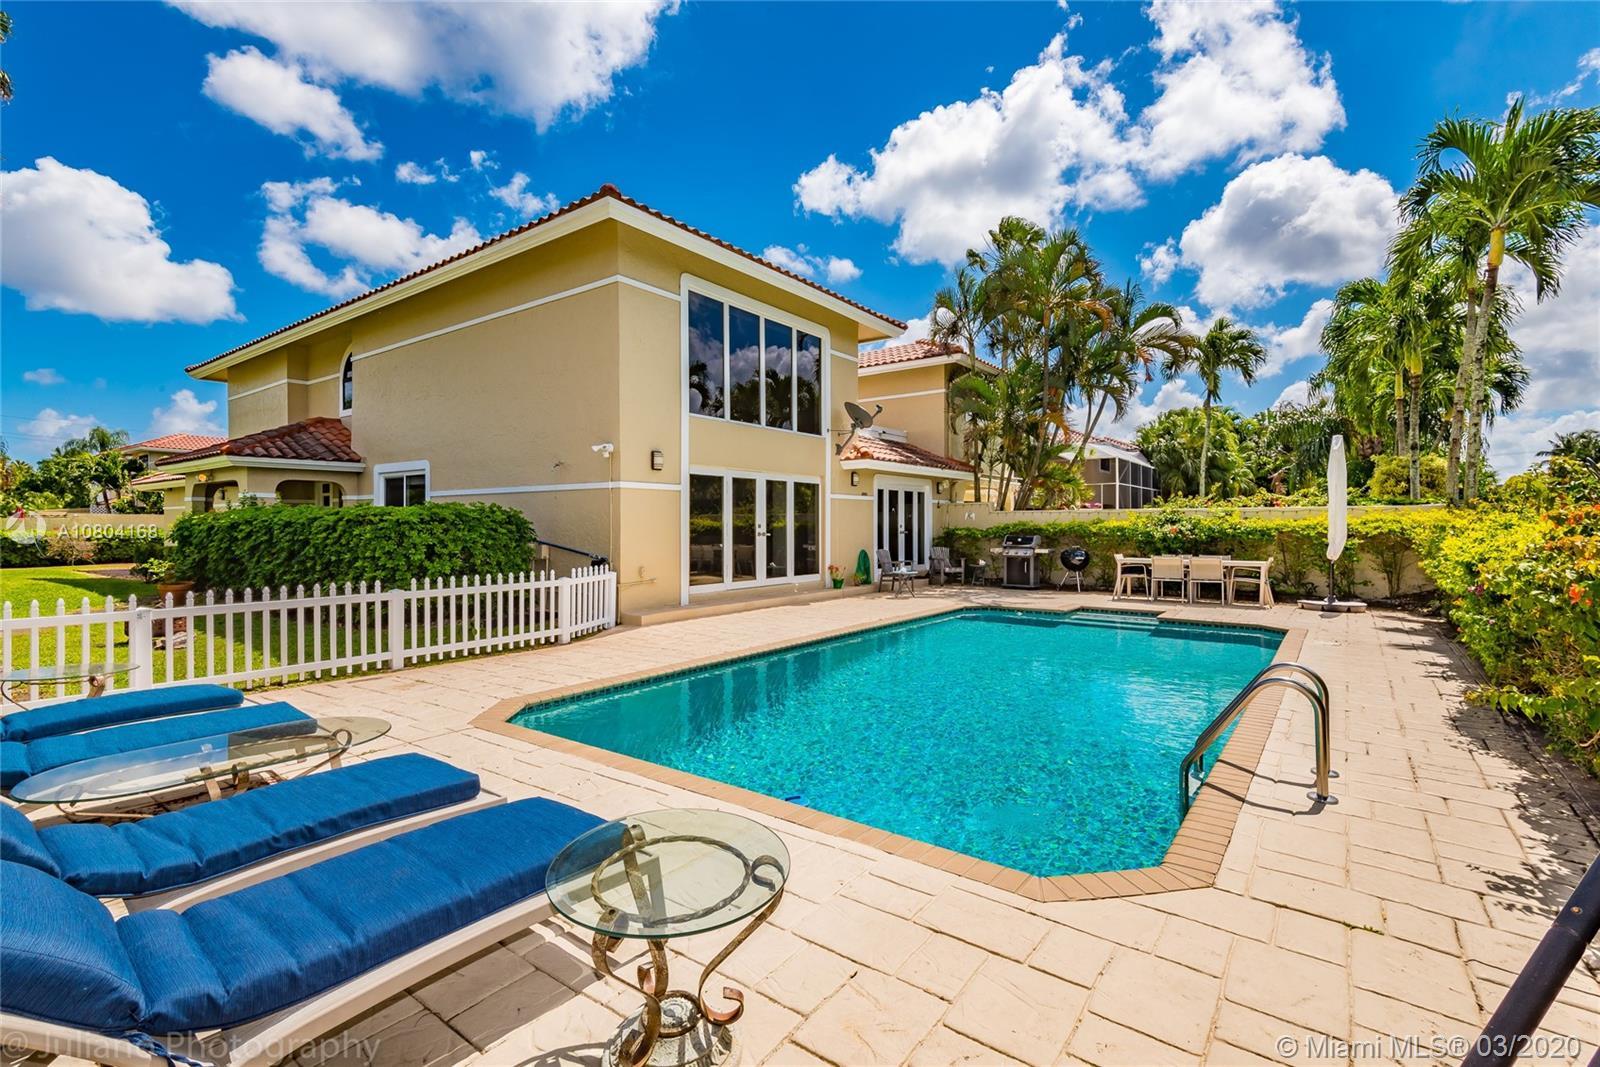 763 Villa Portofino Cir, Deerfield Beach, FL 33442